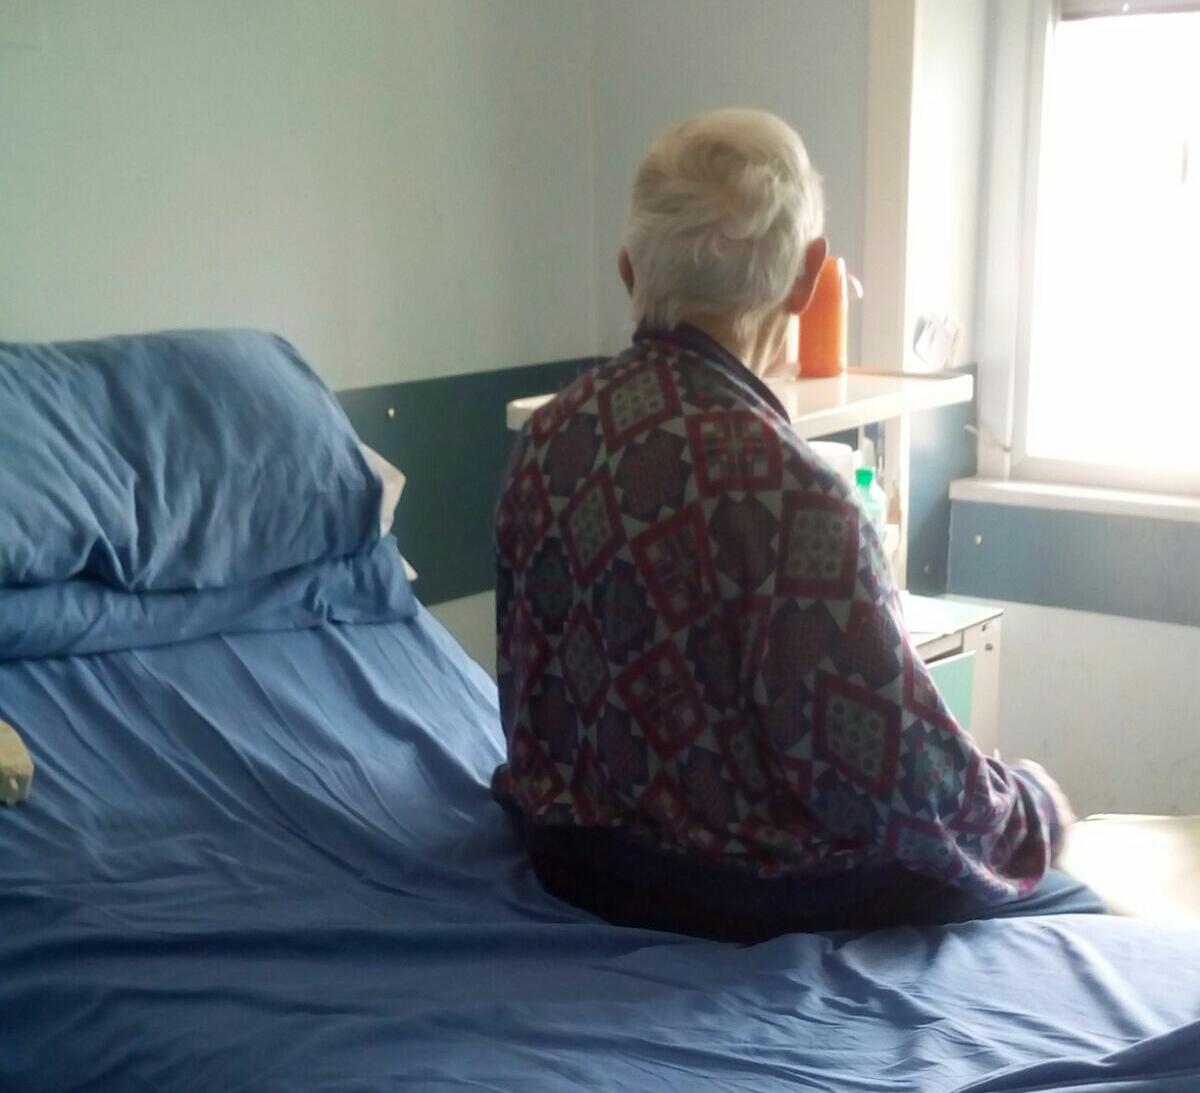 Malattie Infettive-PO Eboli-Degente